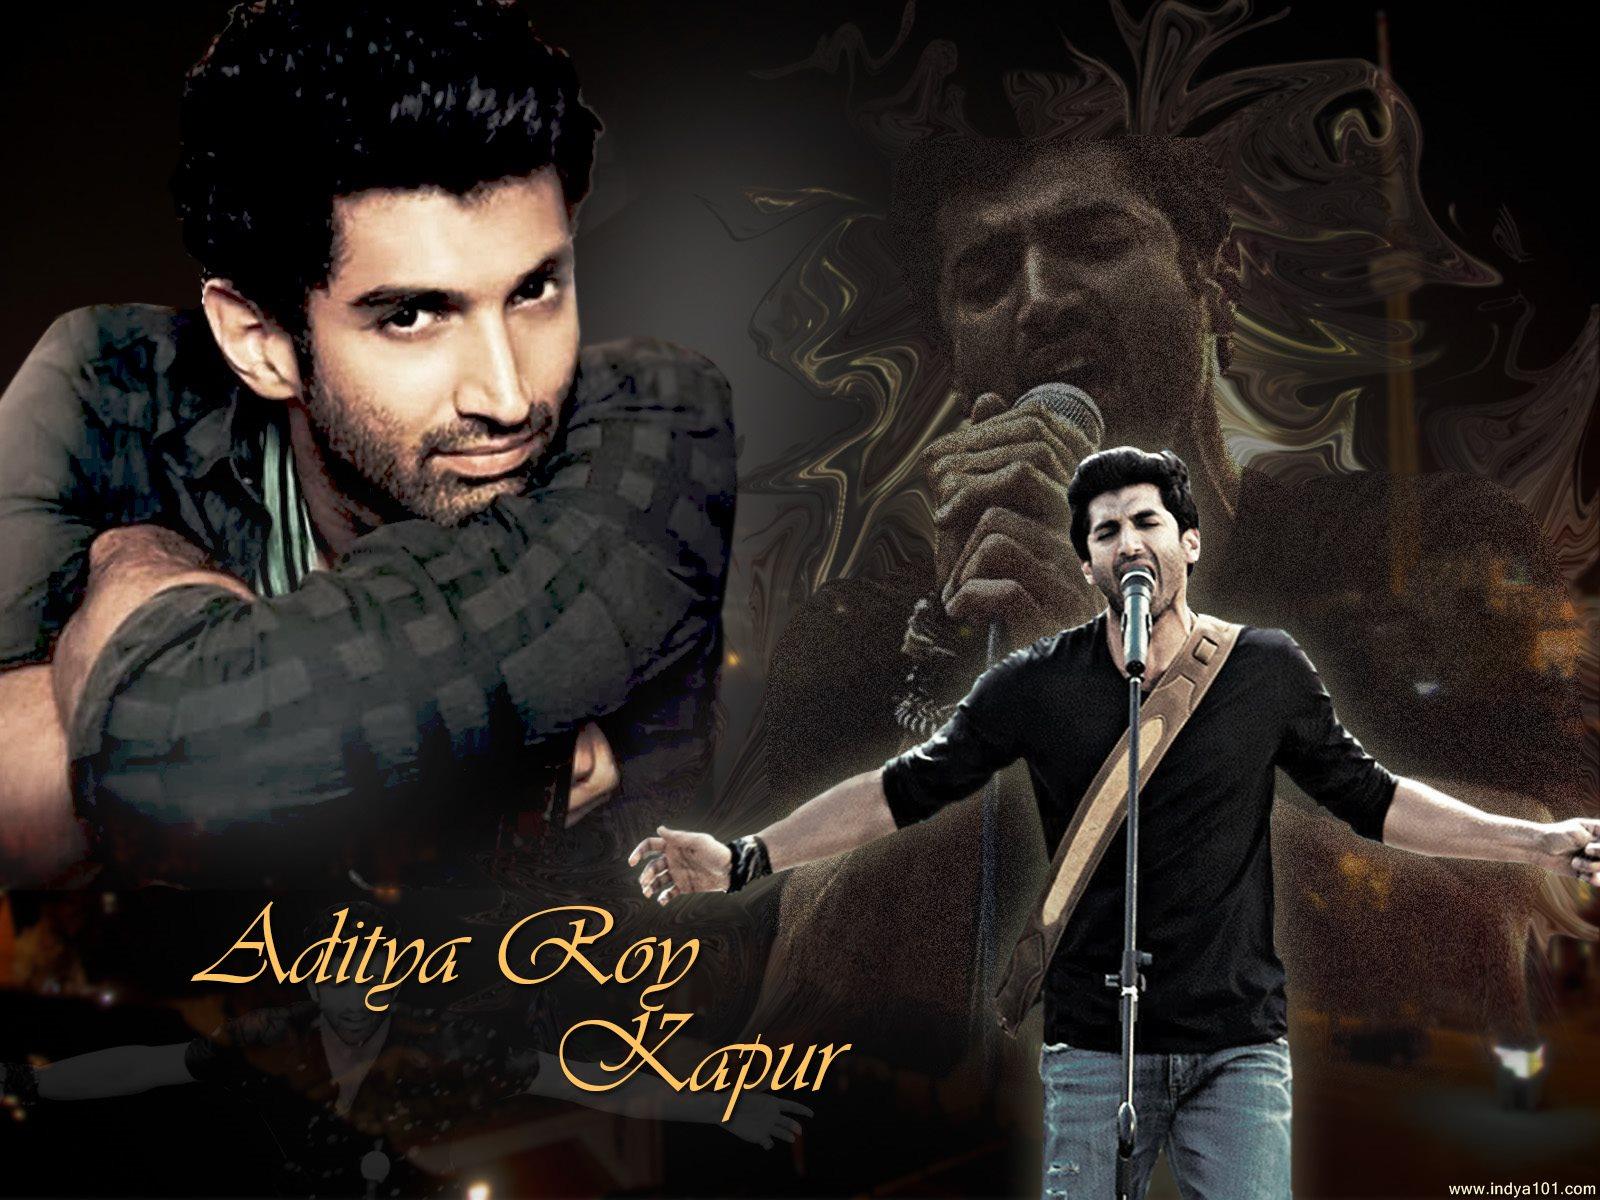 Aditya Roy Kapoor In Aashiqui 2 1600x1200 Wallpaper Teahub Io